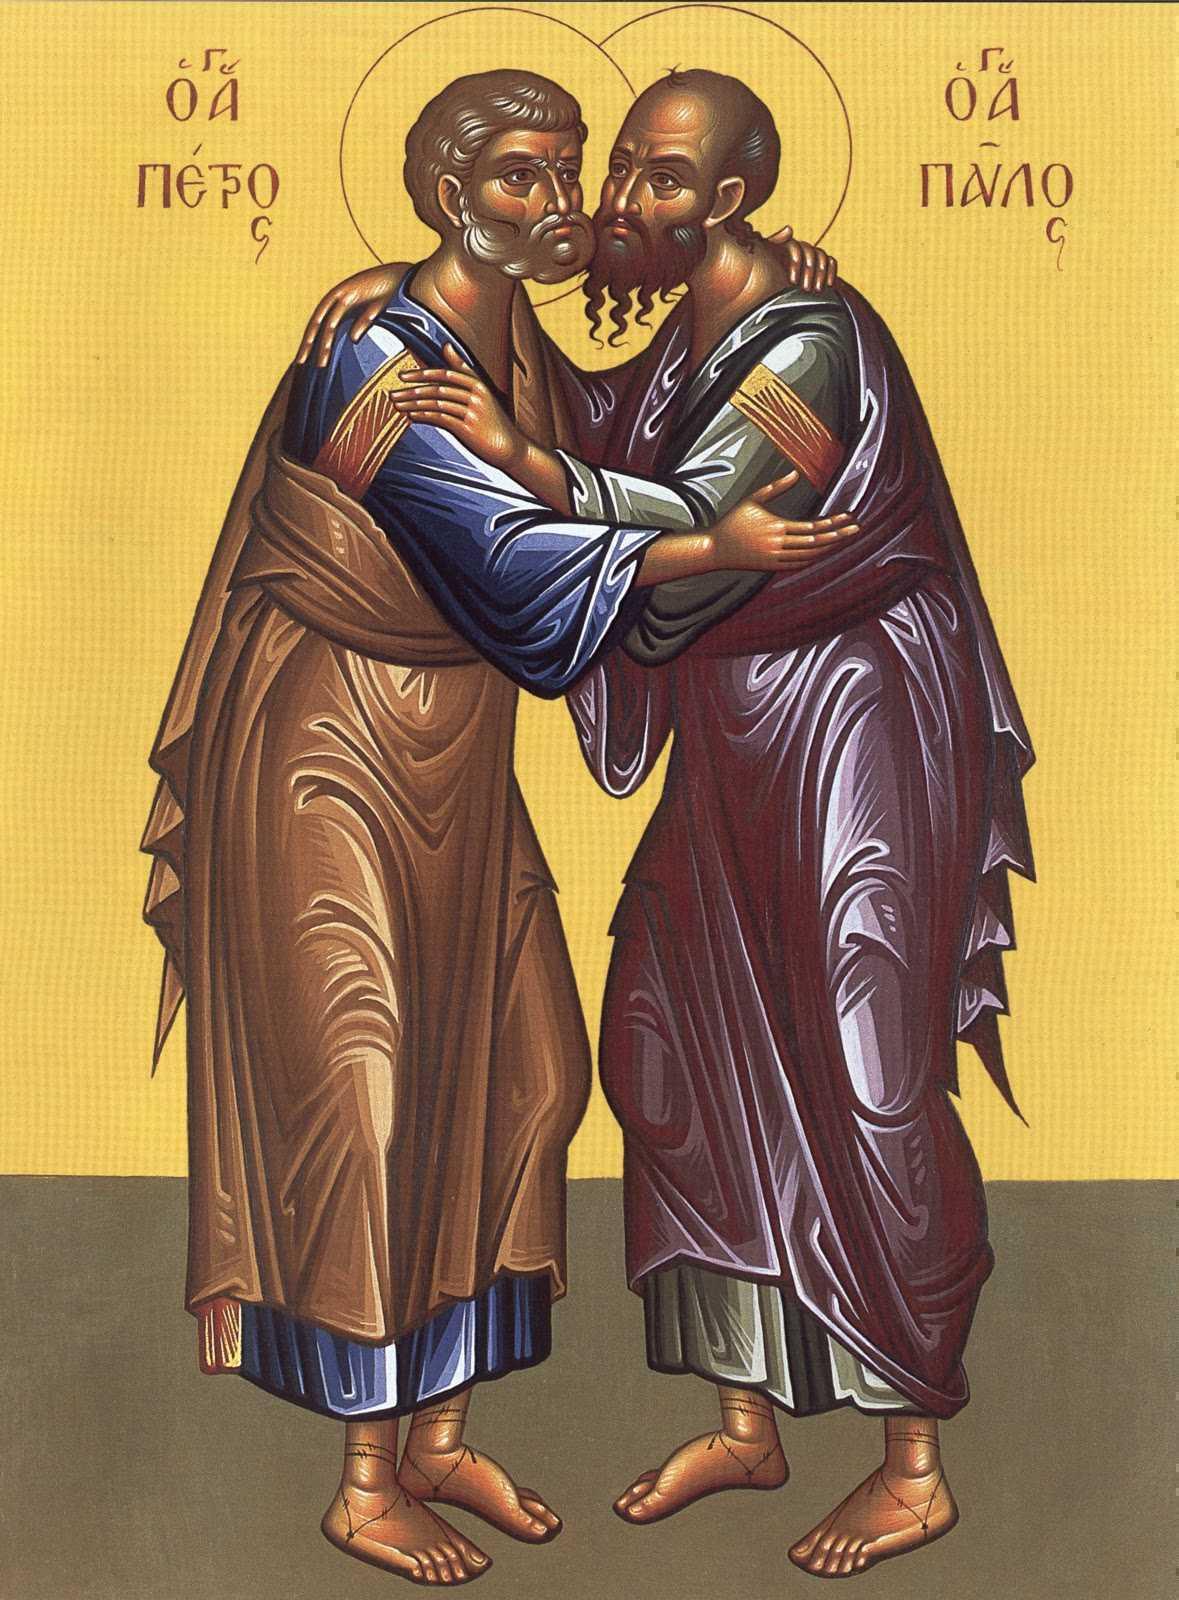 Teofilact Icoane: Icoane rusesti superbe  |Sf. Petru Si Pavel